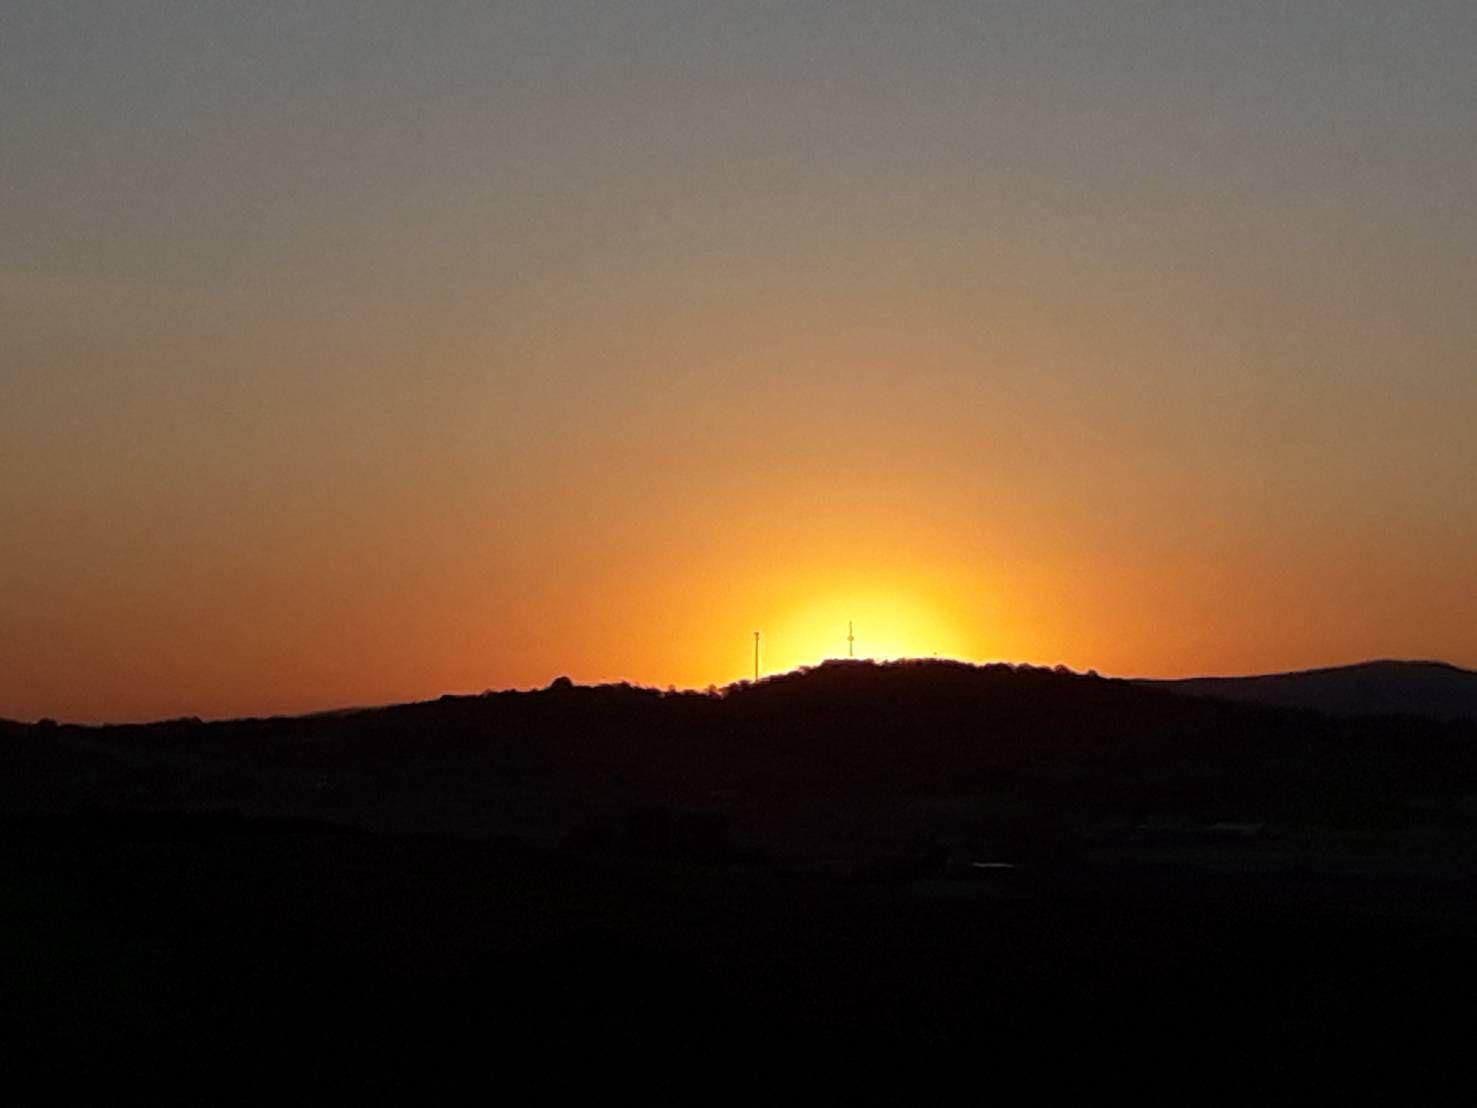 Good morning world, Mark Alexander, 6 mai 2020, 6:59